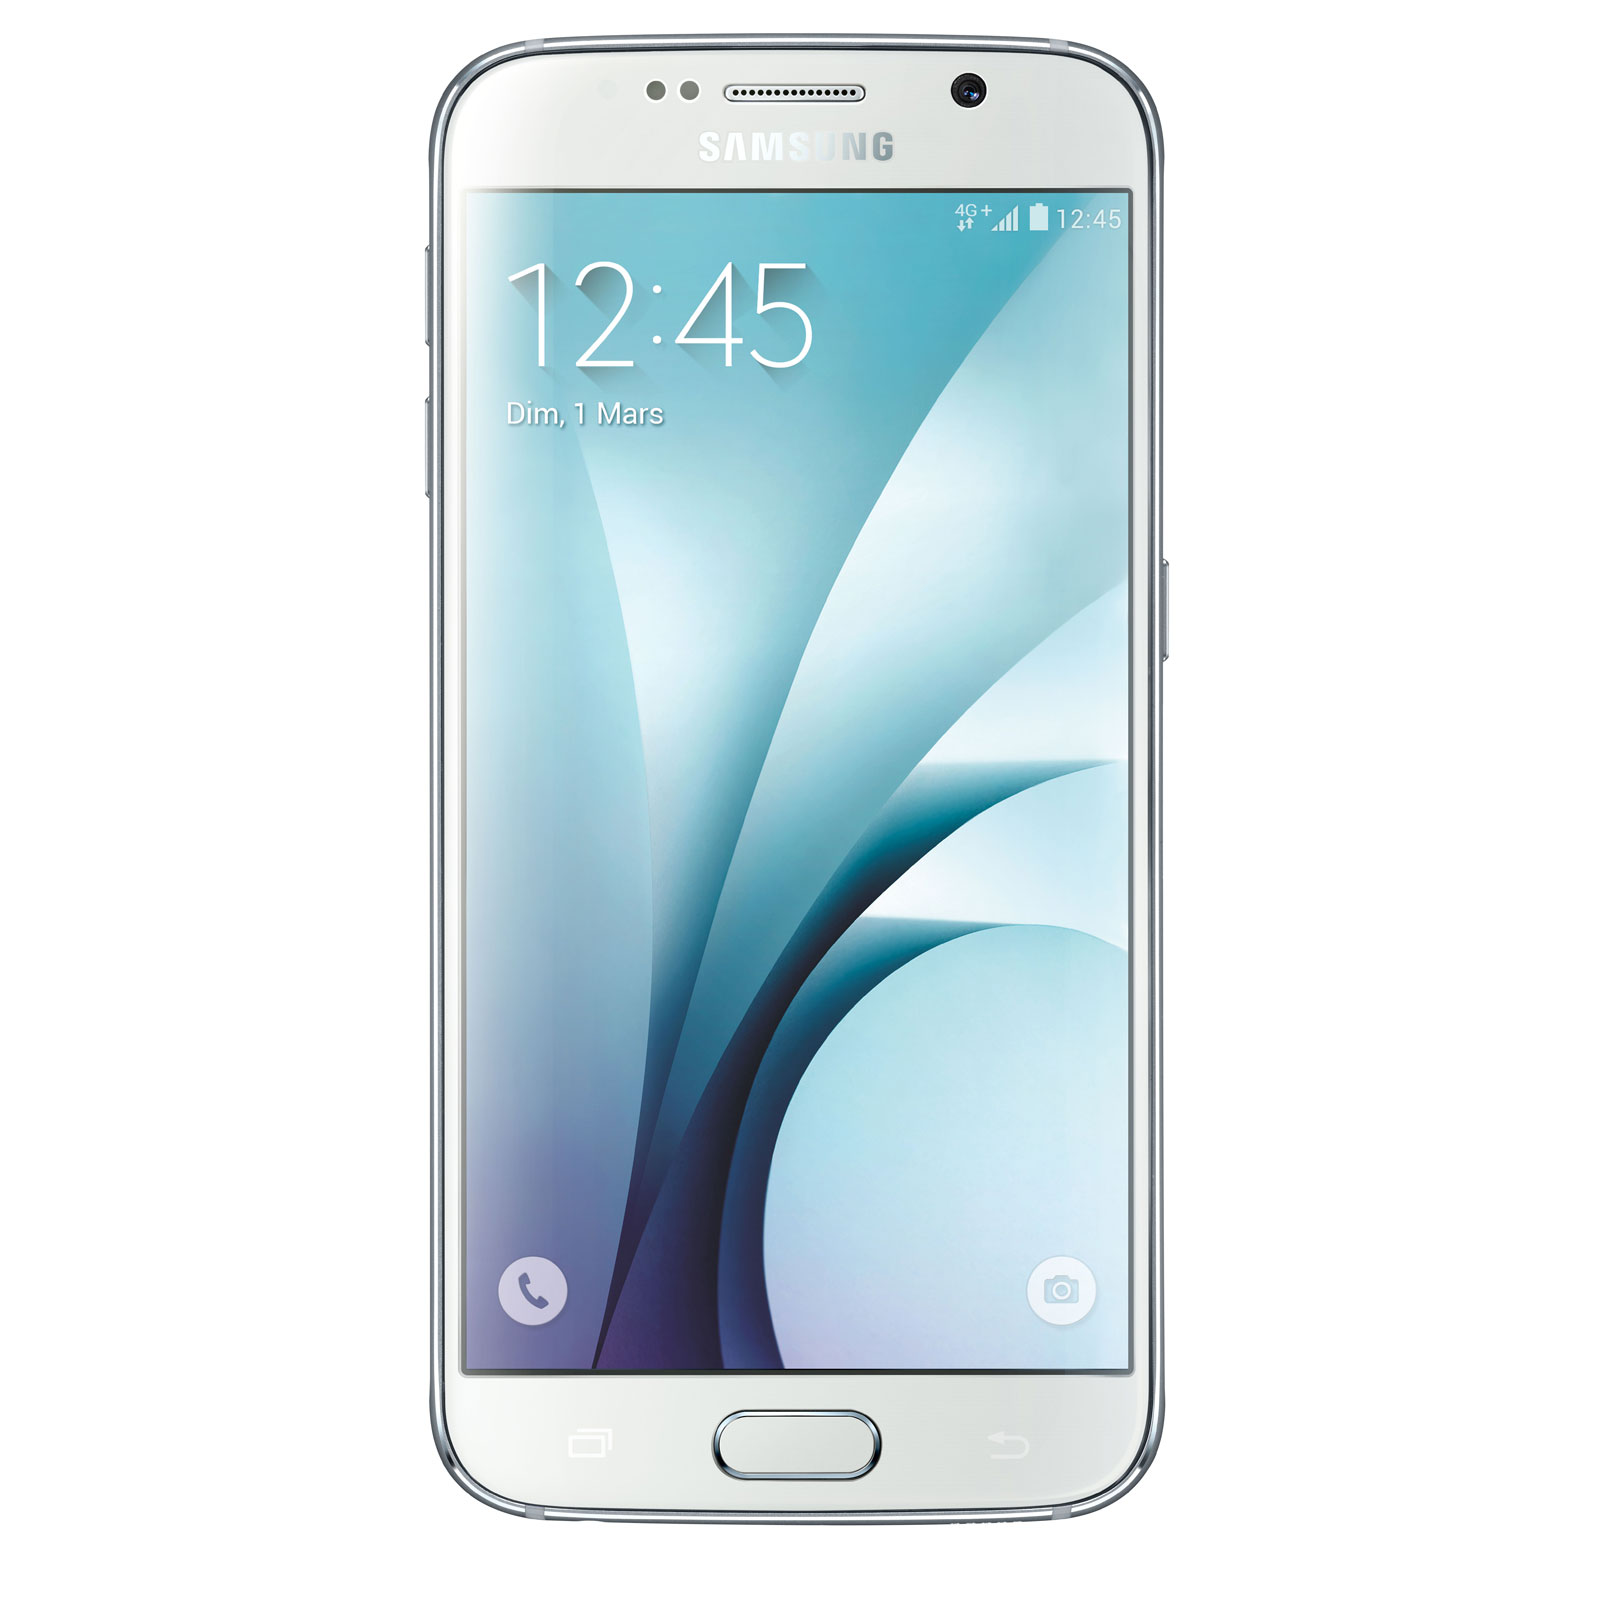 Samsung Galaxy S6 SM-G920F Blanc 32 Go - Mobile   smartphone Samsung ... 4b6e85fd96c1